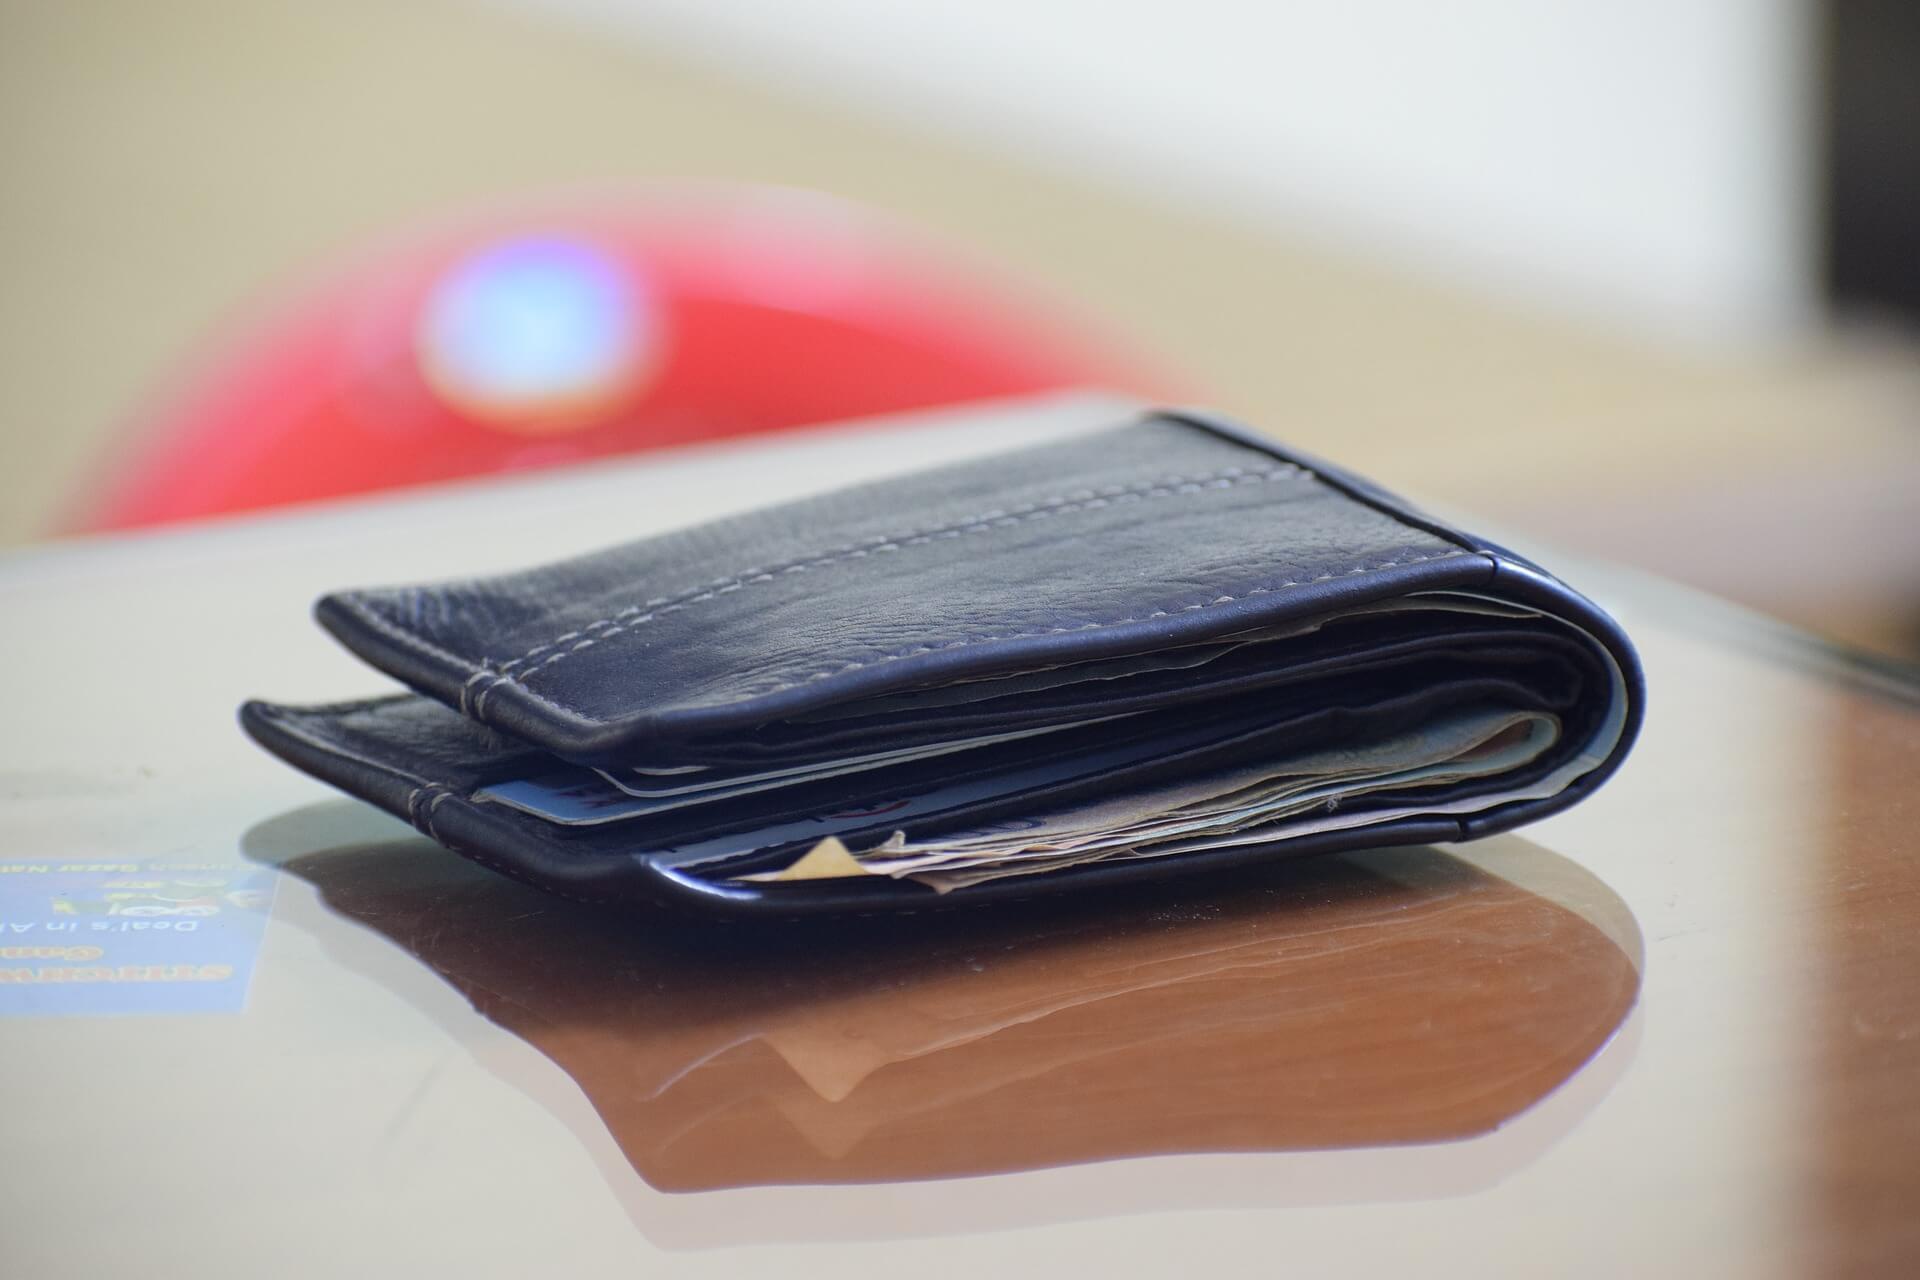 wallet-2456004_1920